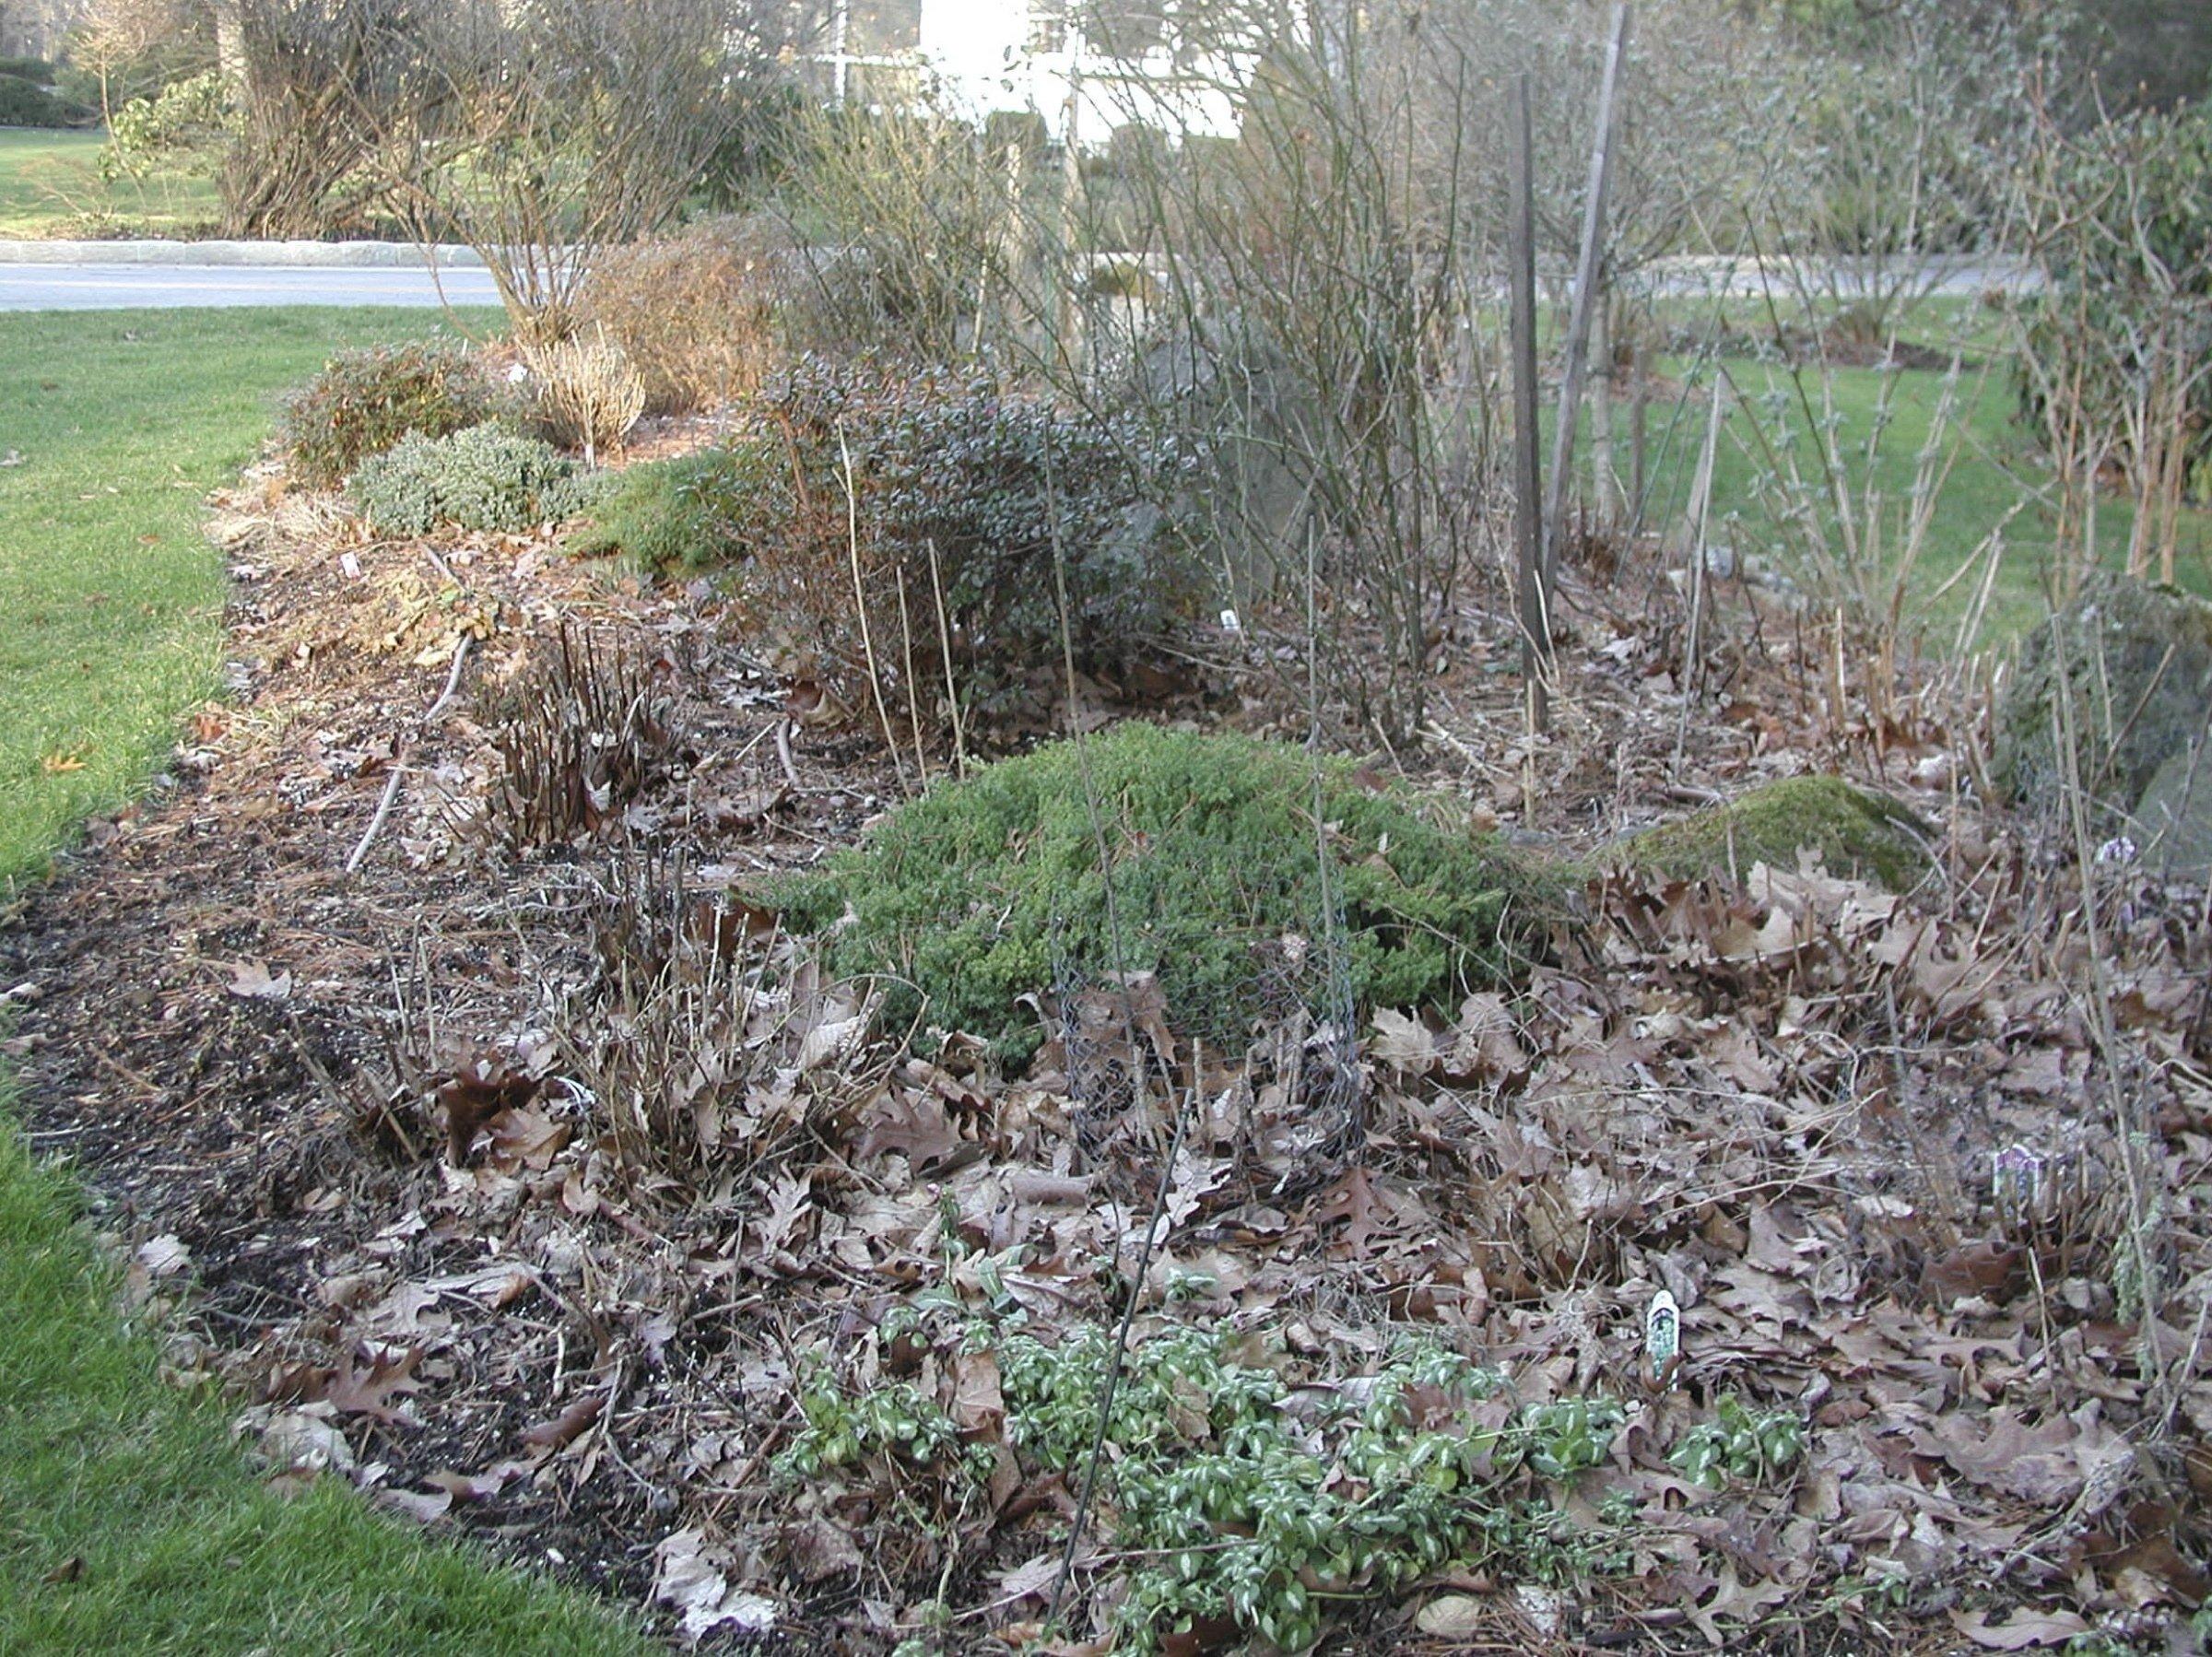 For 'weedless gardening' next spring, begin now